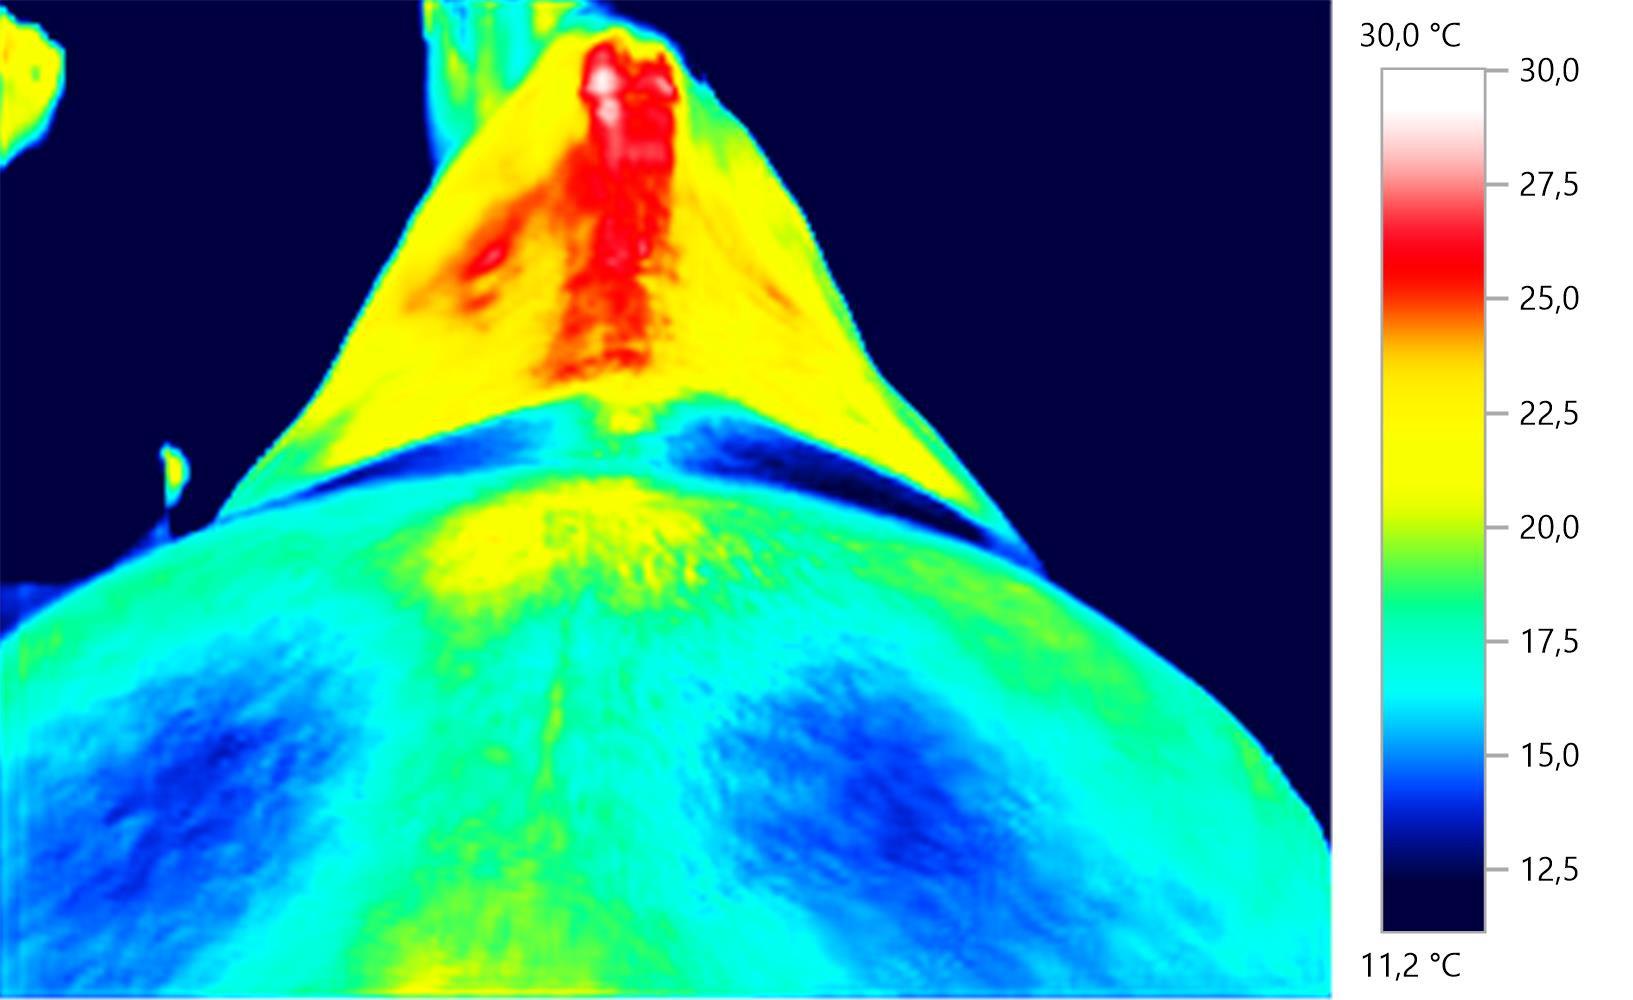 Pferdethermografie: energ Störungsmuster